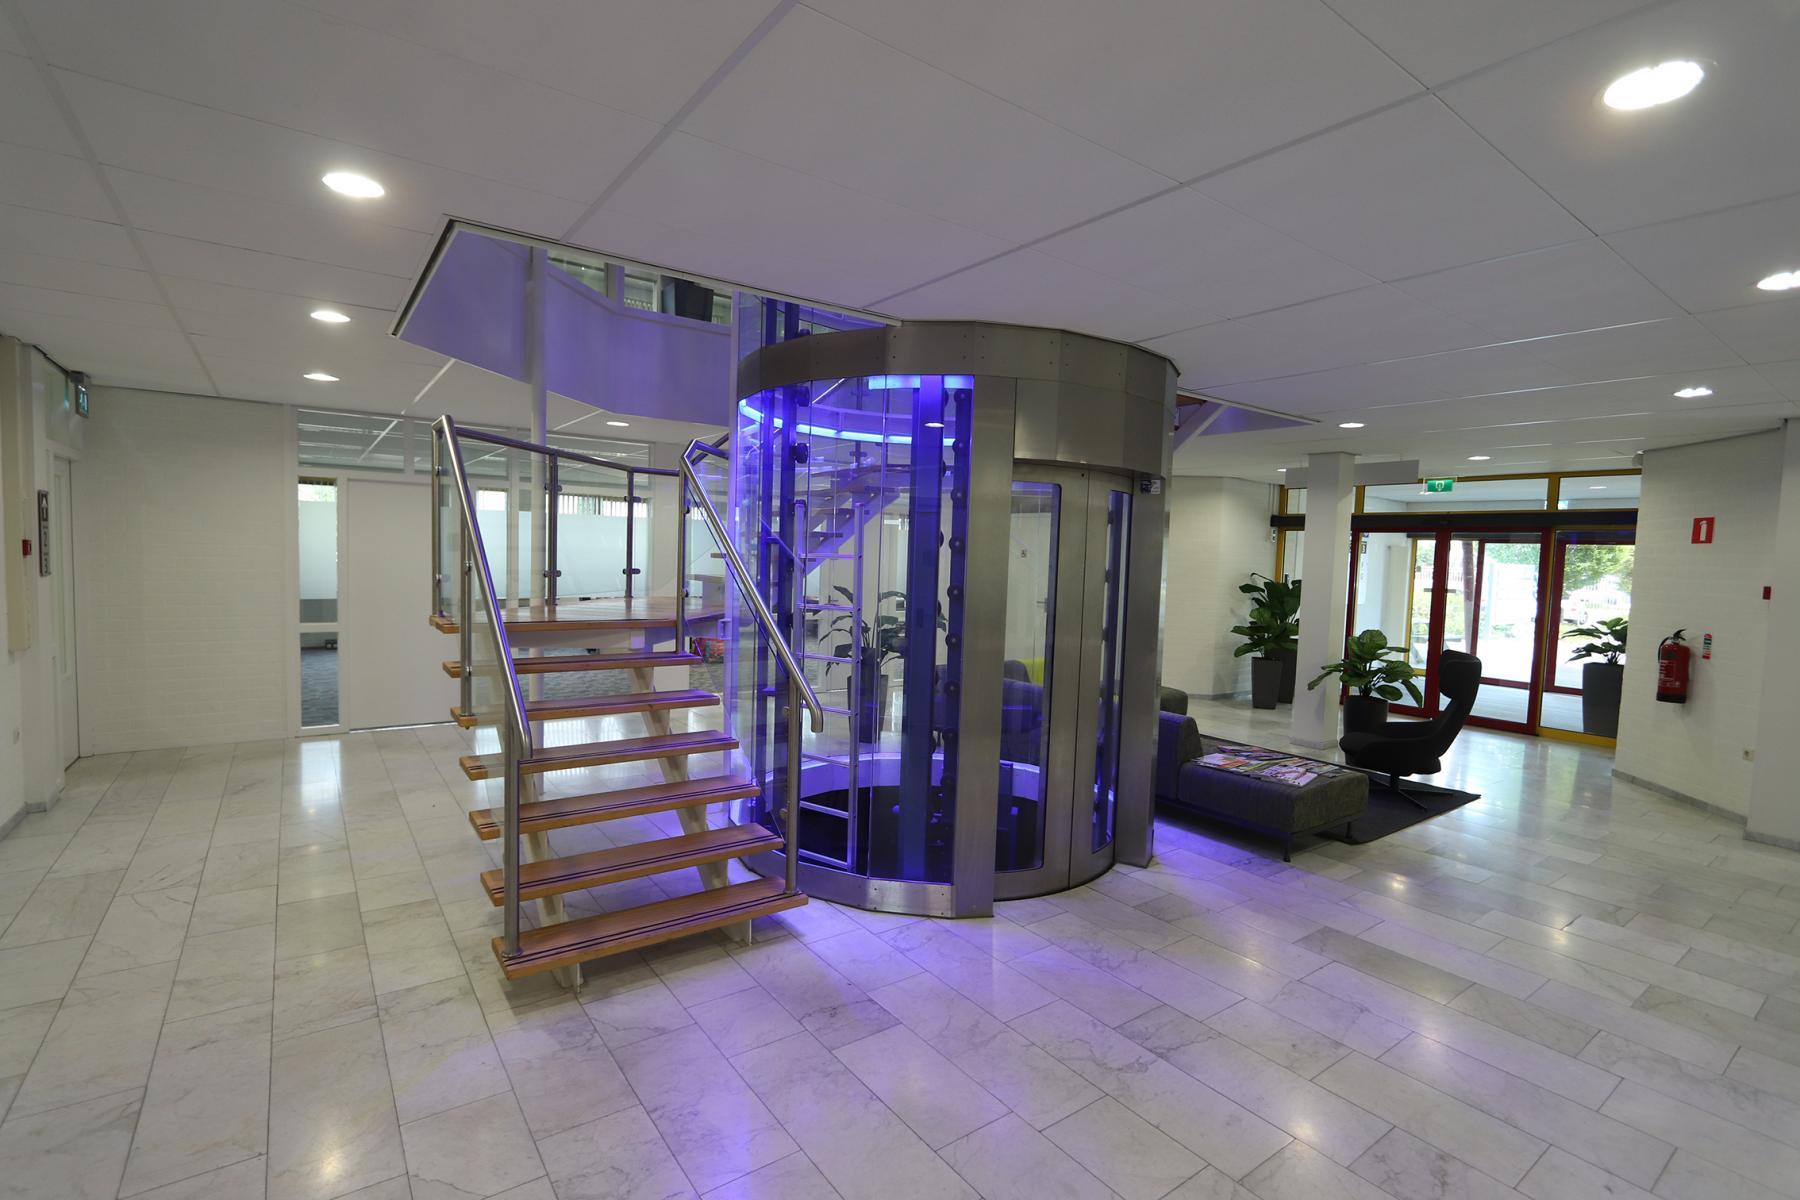 Rent office space Parlevinkerweg 1, Venlo (11)